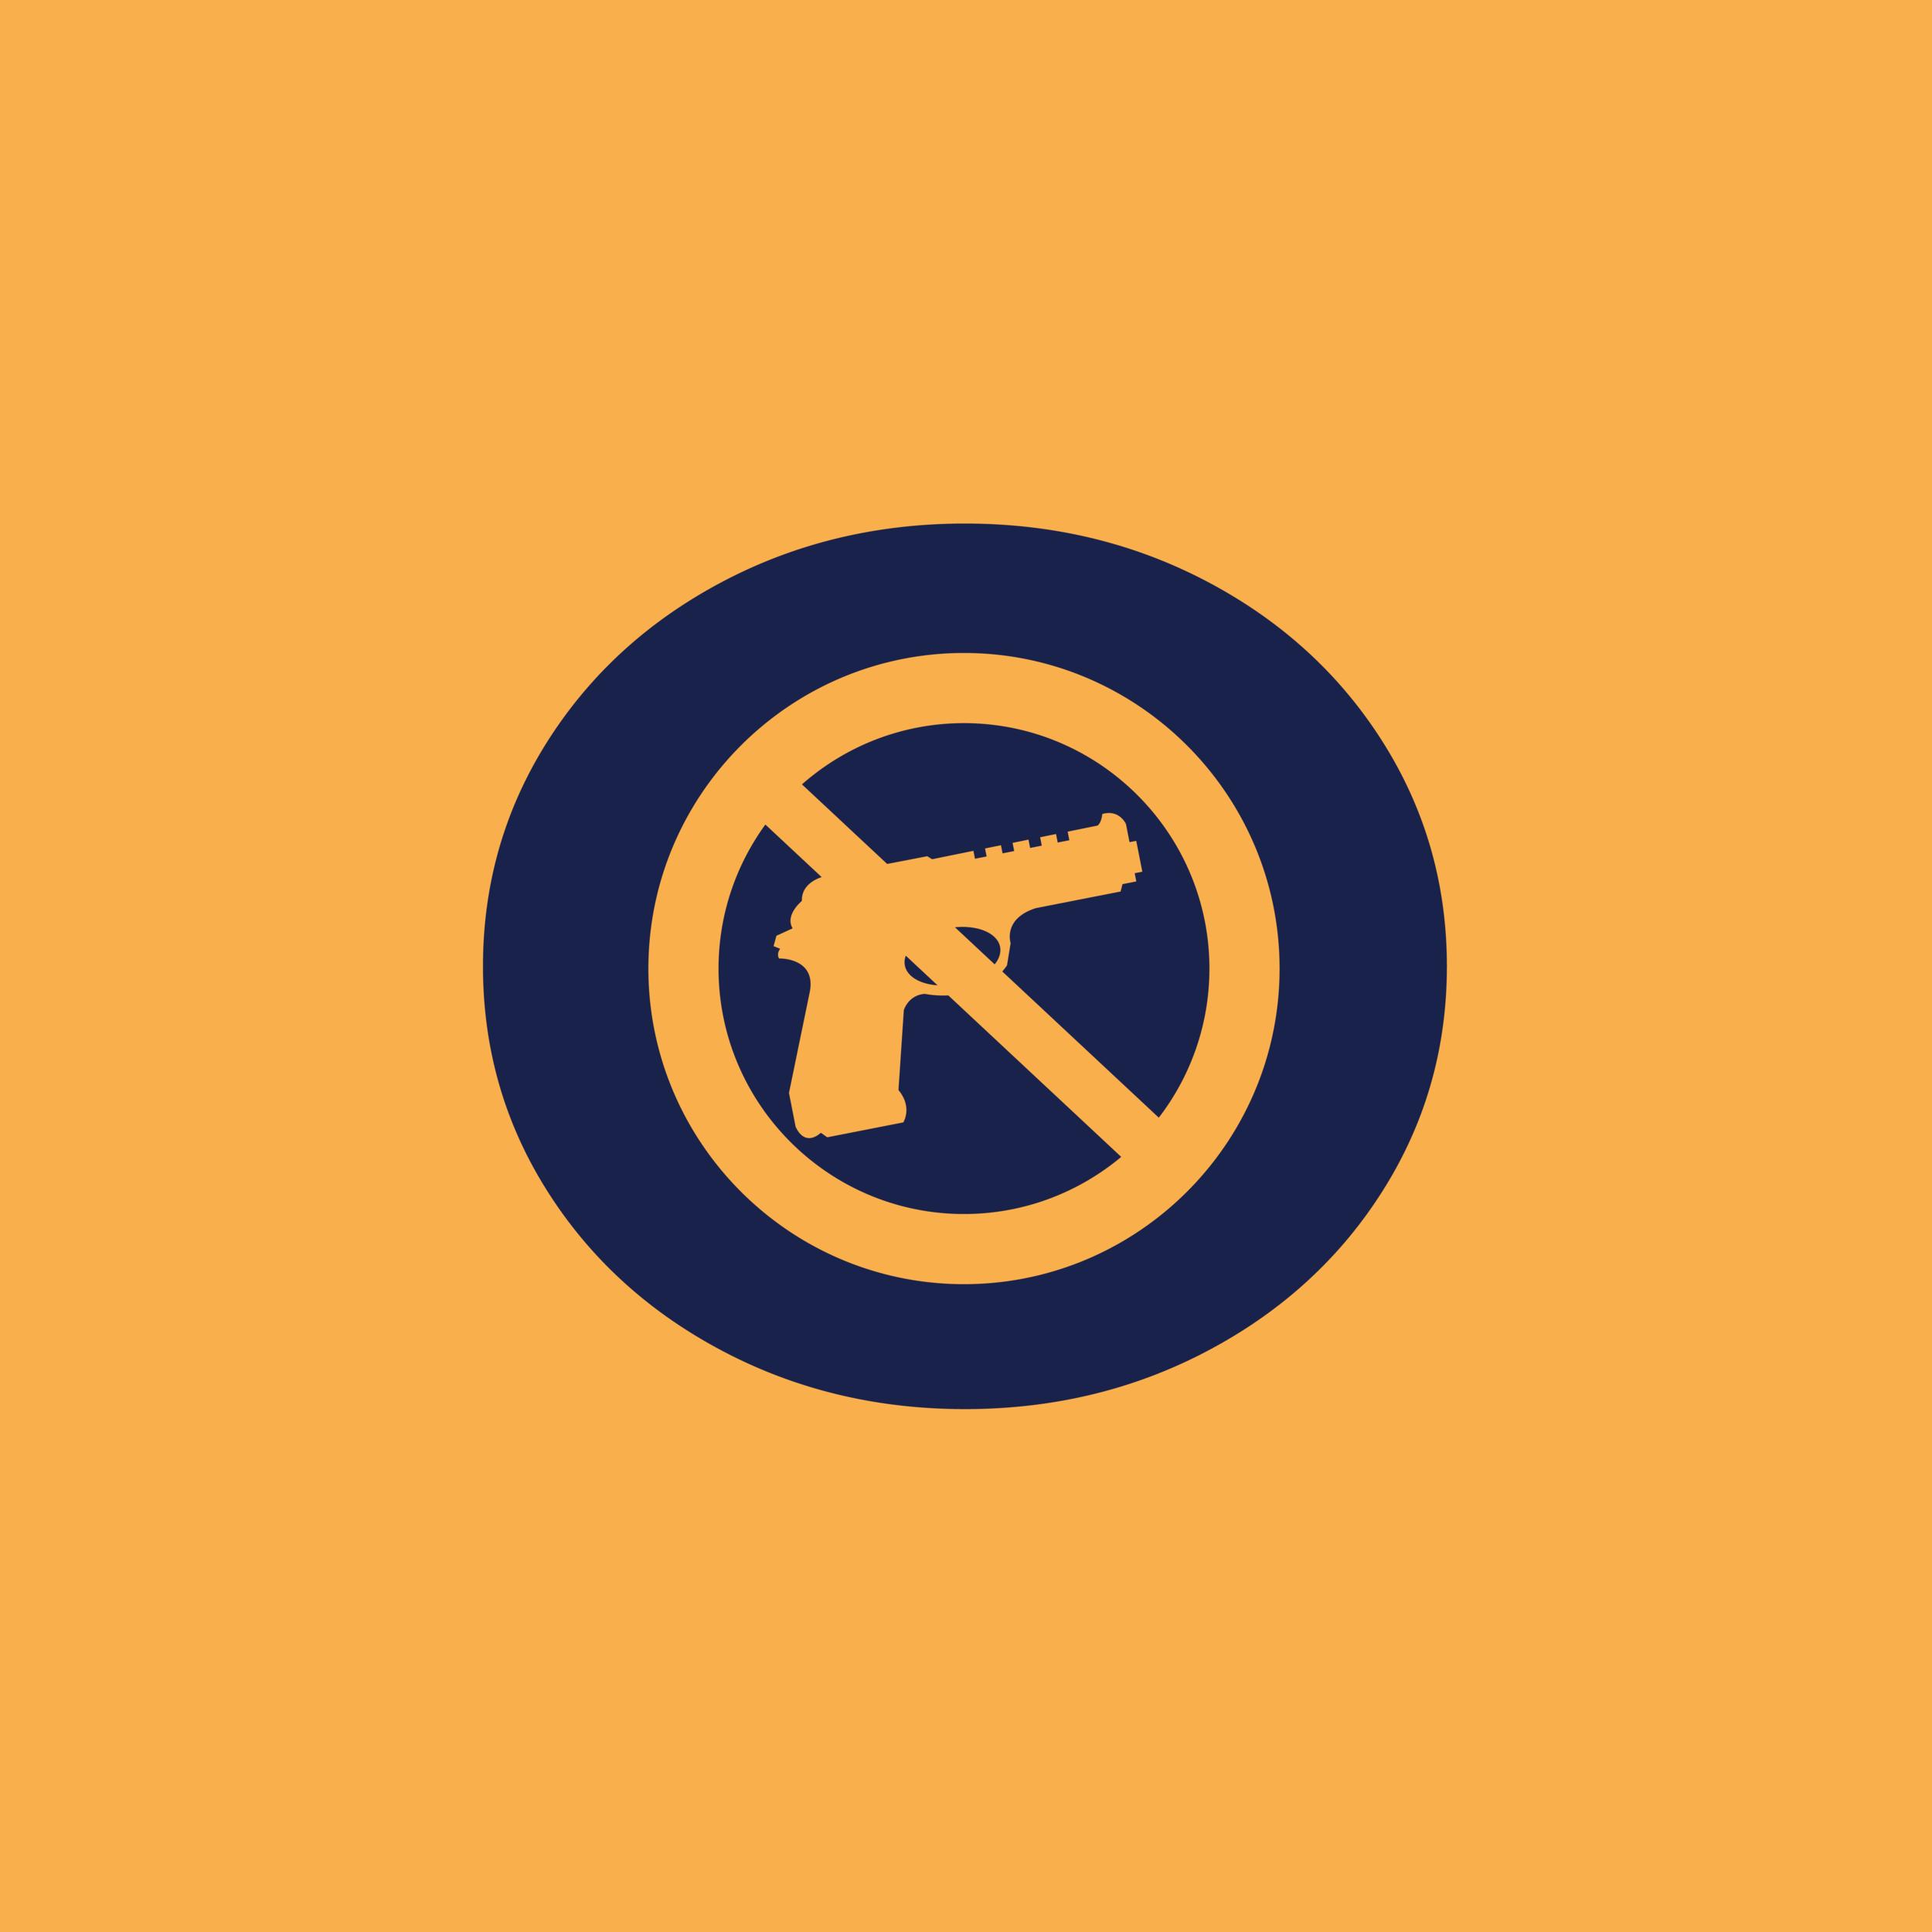 Ending Gun Violence - The more guns in a community, the more violence there is.Read More →